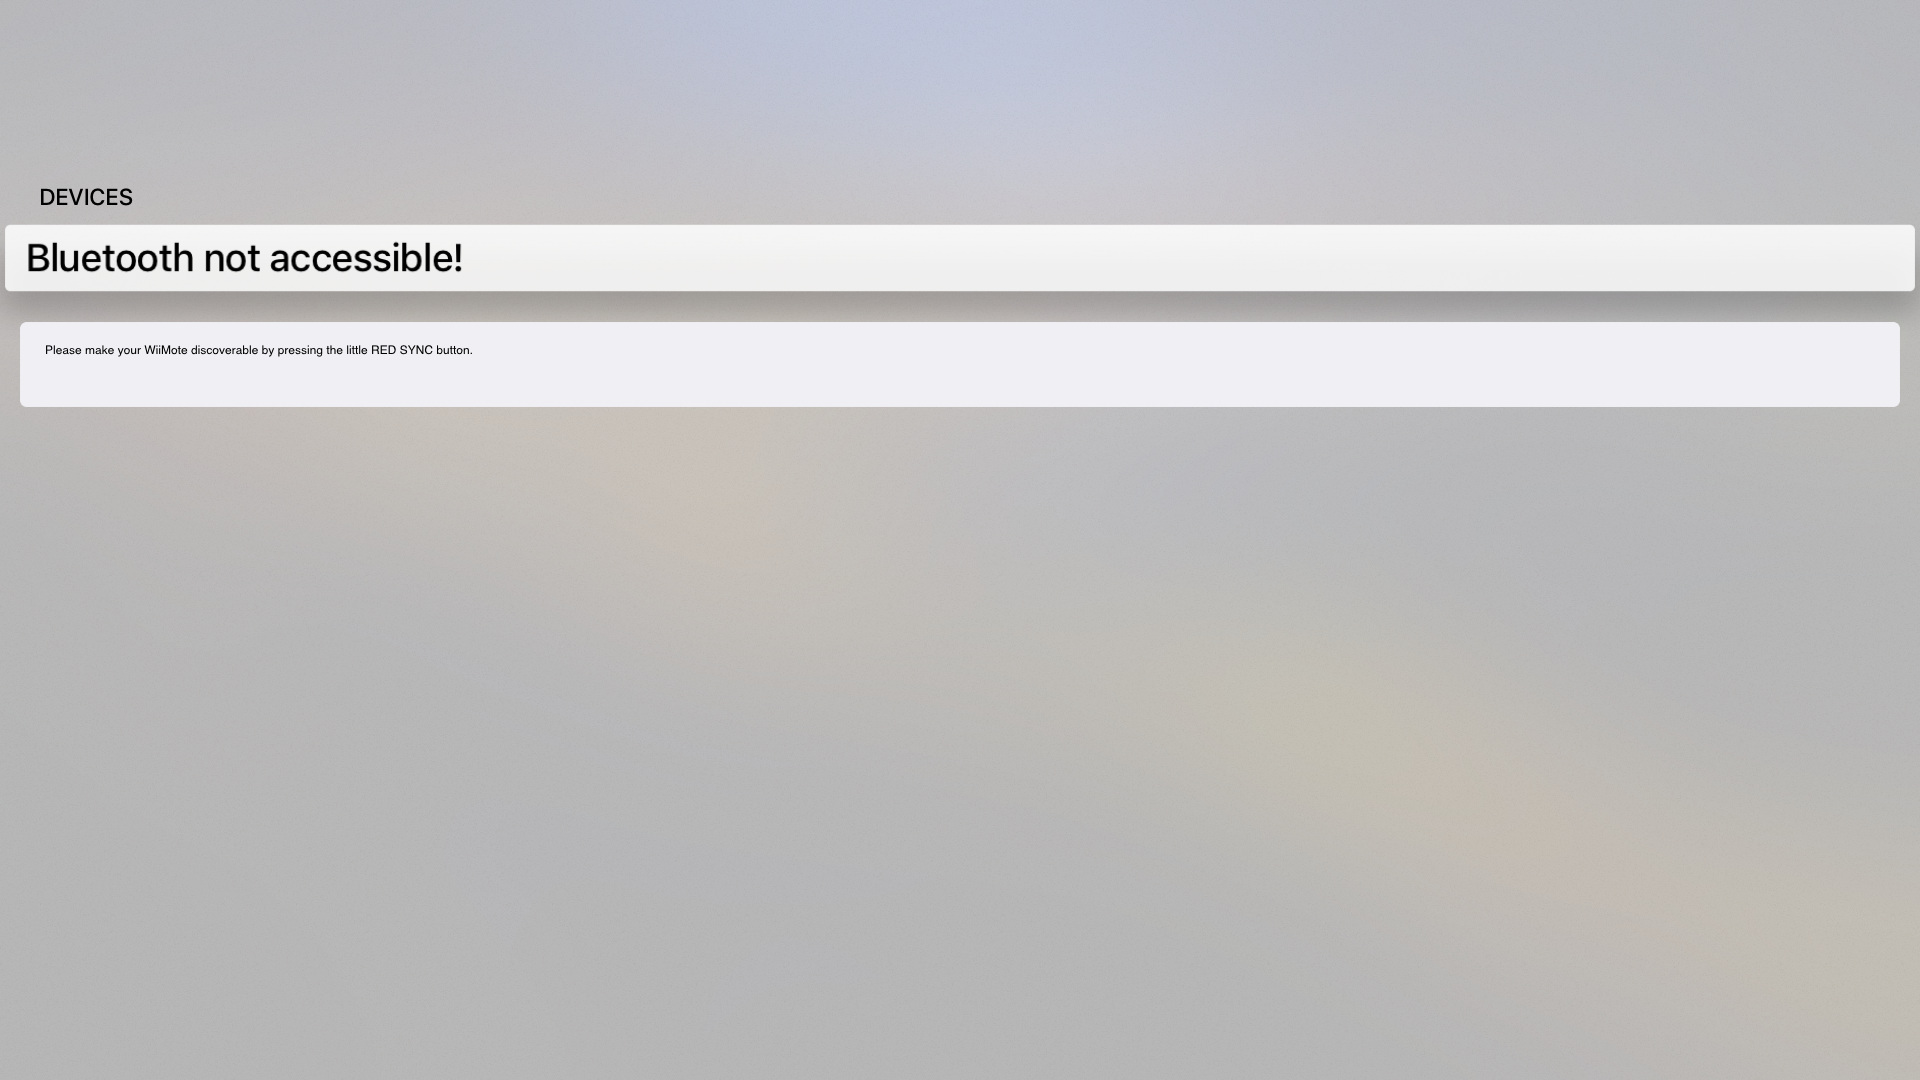 Proper iOS 11 support? · Issue #120 · bluekitchen/btstack · GitHub